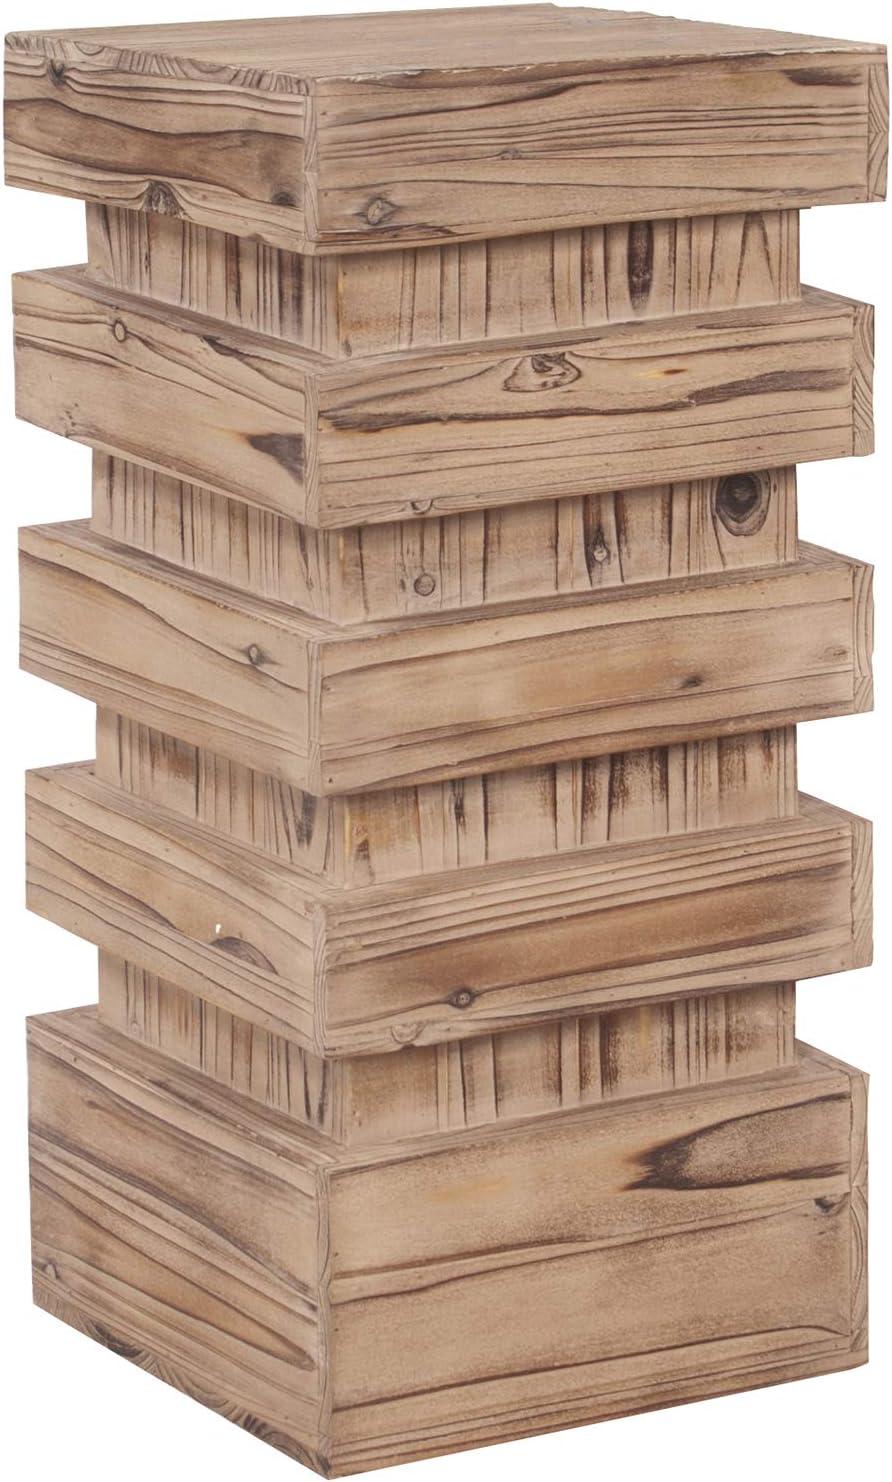 Howard Elliott Stepped Pedestal Accent Table, Medium, Natural Wood, 12 x 12 x 26 Inch